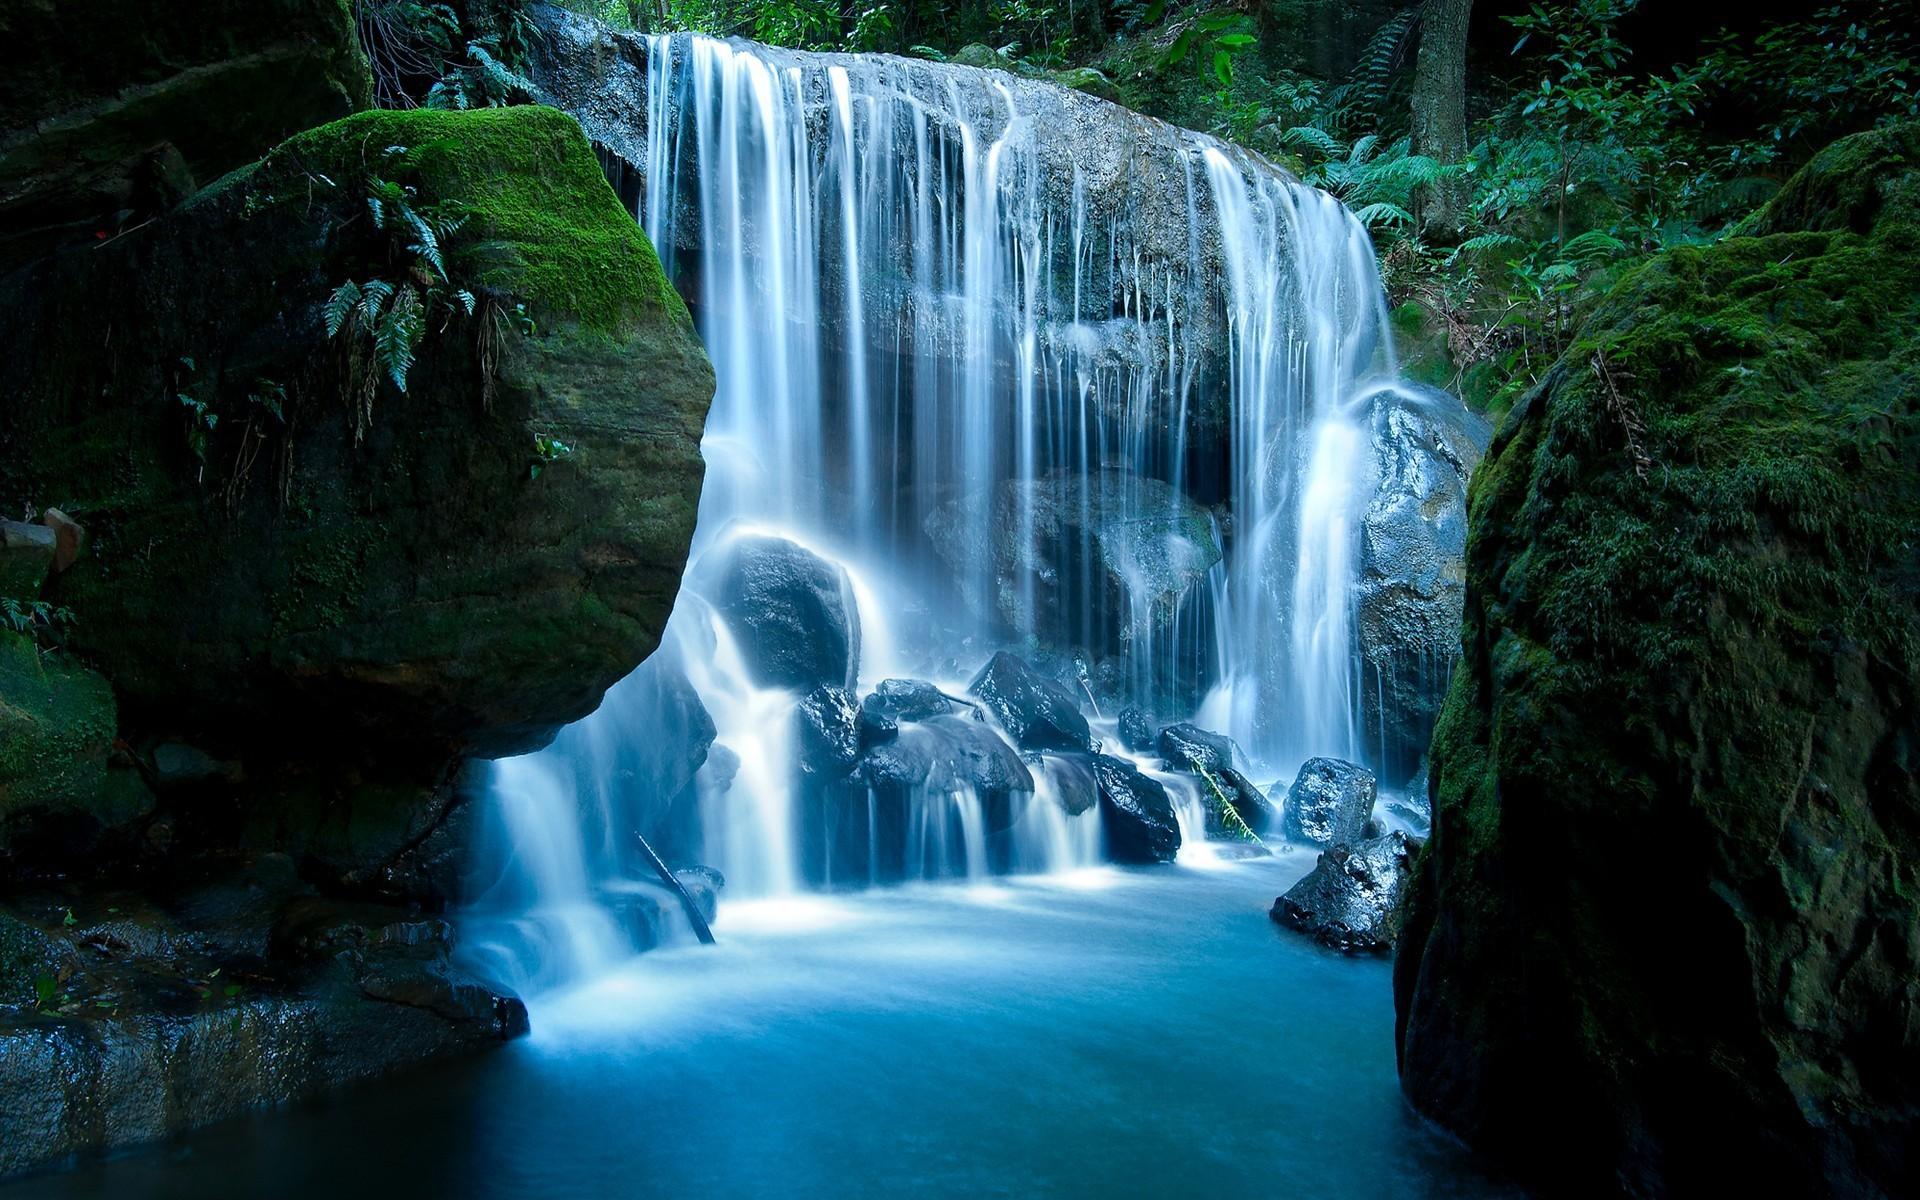 природному картинки на телефон водопады движущиеся море могут